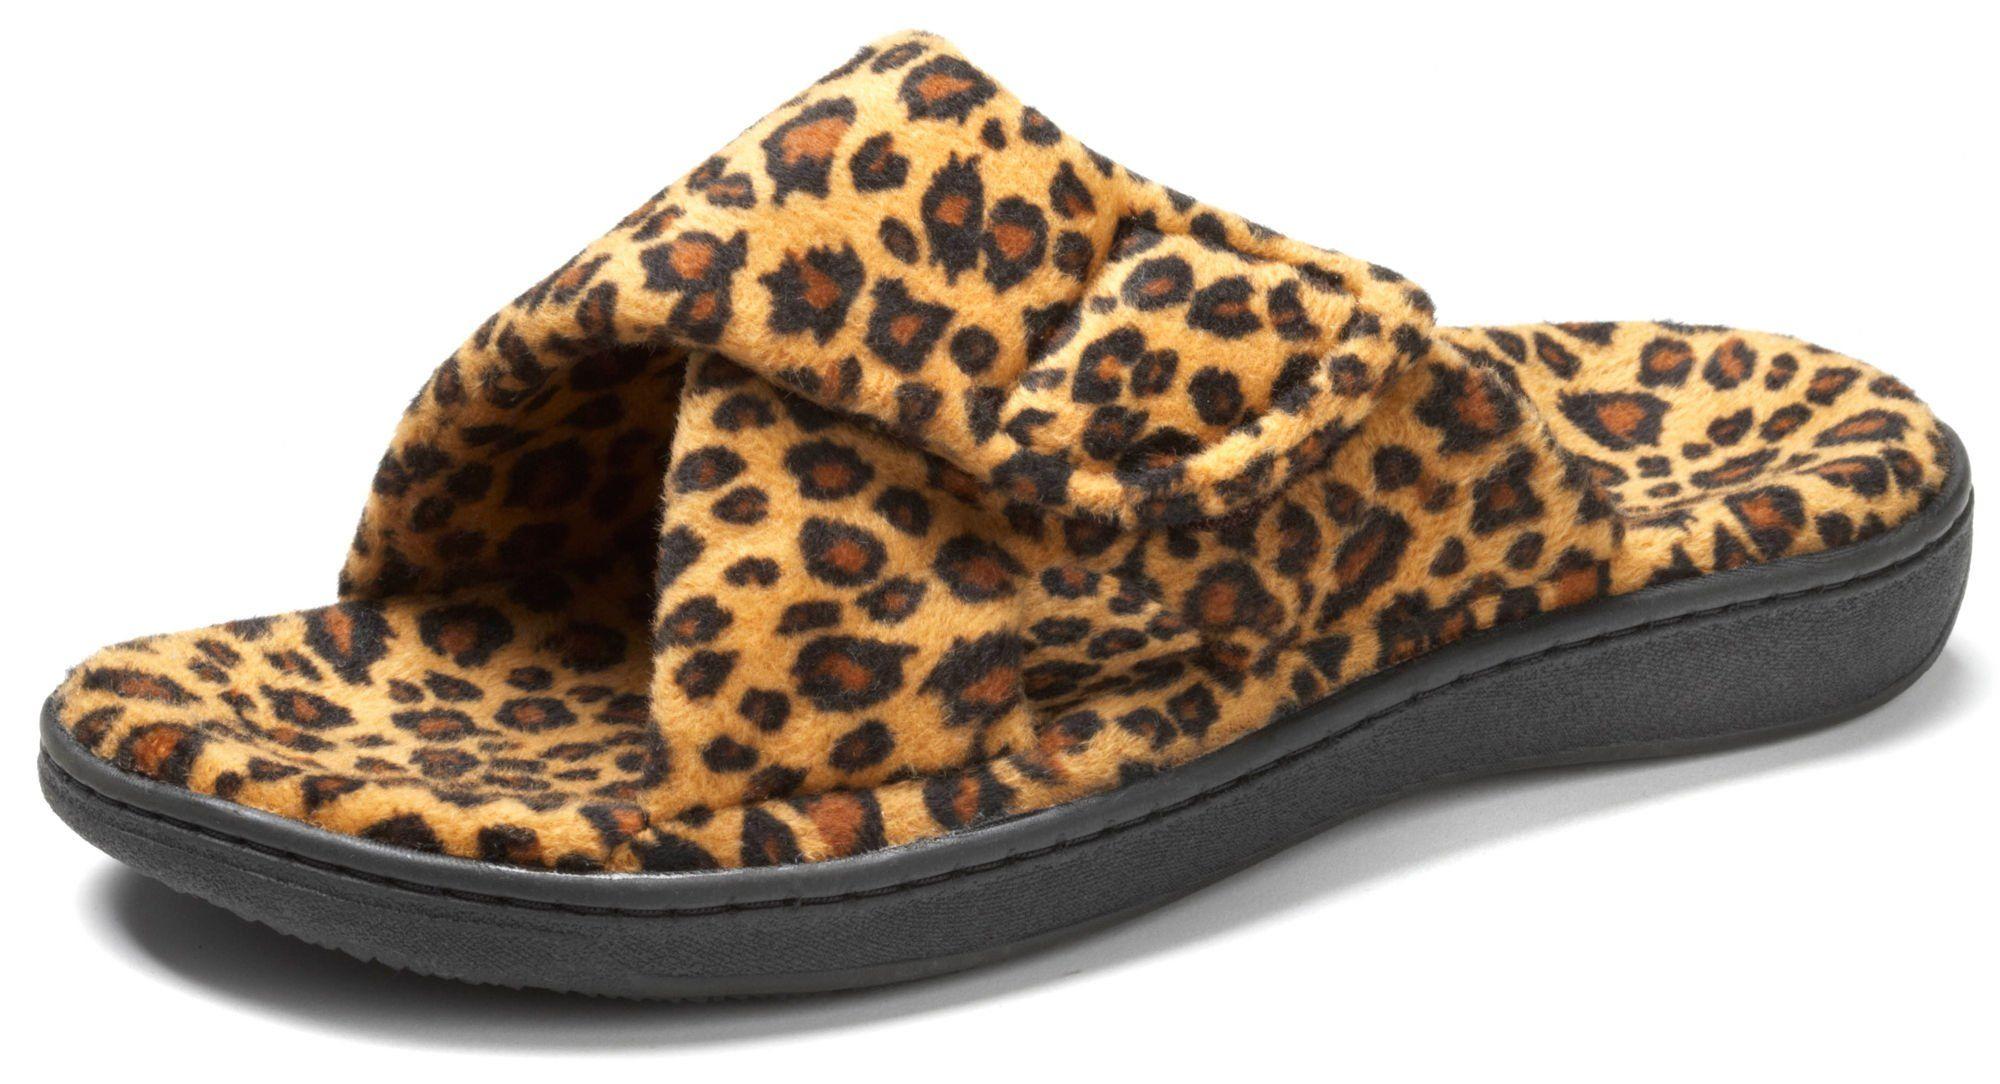 476c2659157 Orthaheel Women s Relax Slippers - Tan Leopard